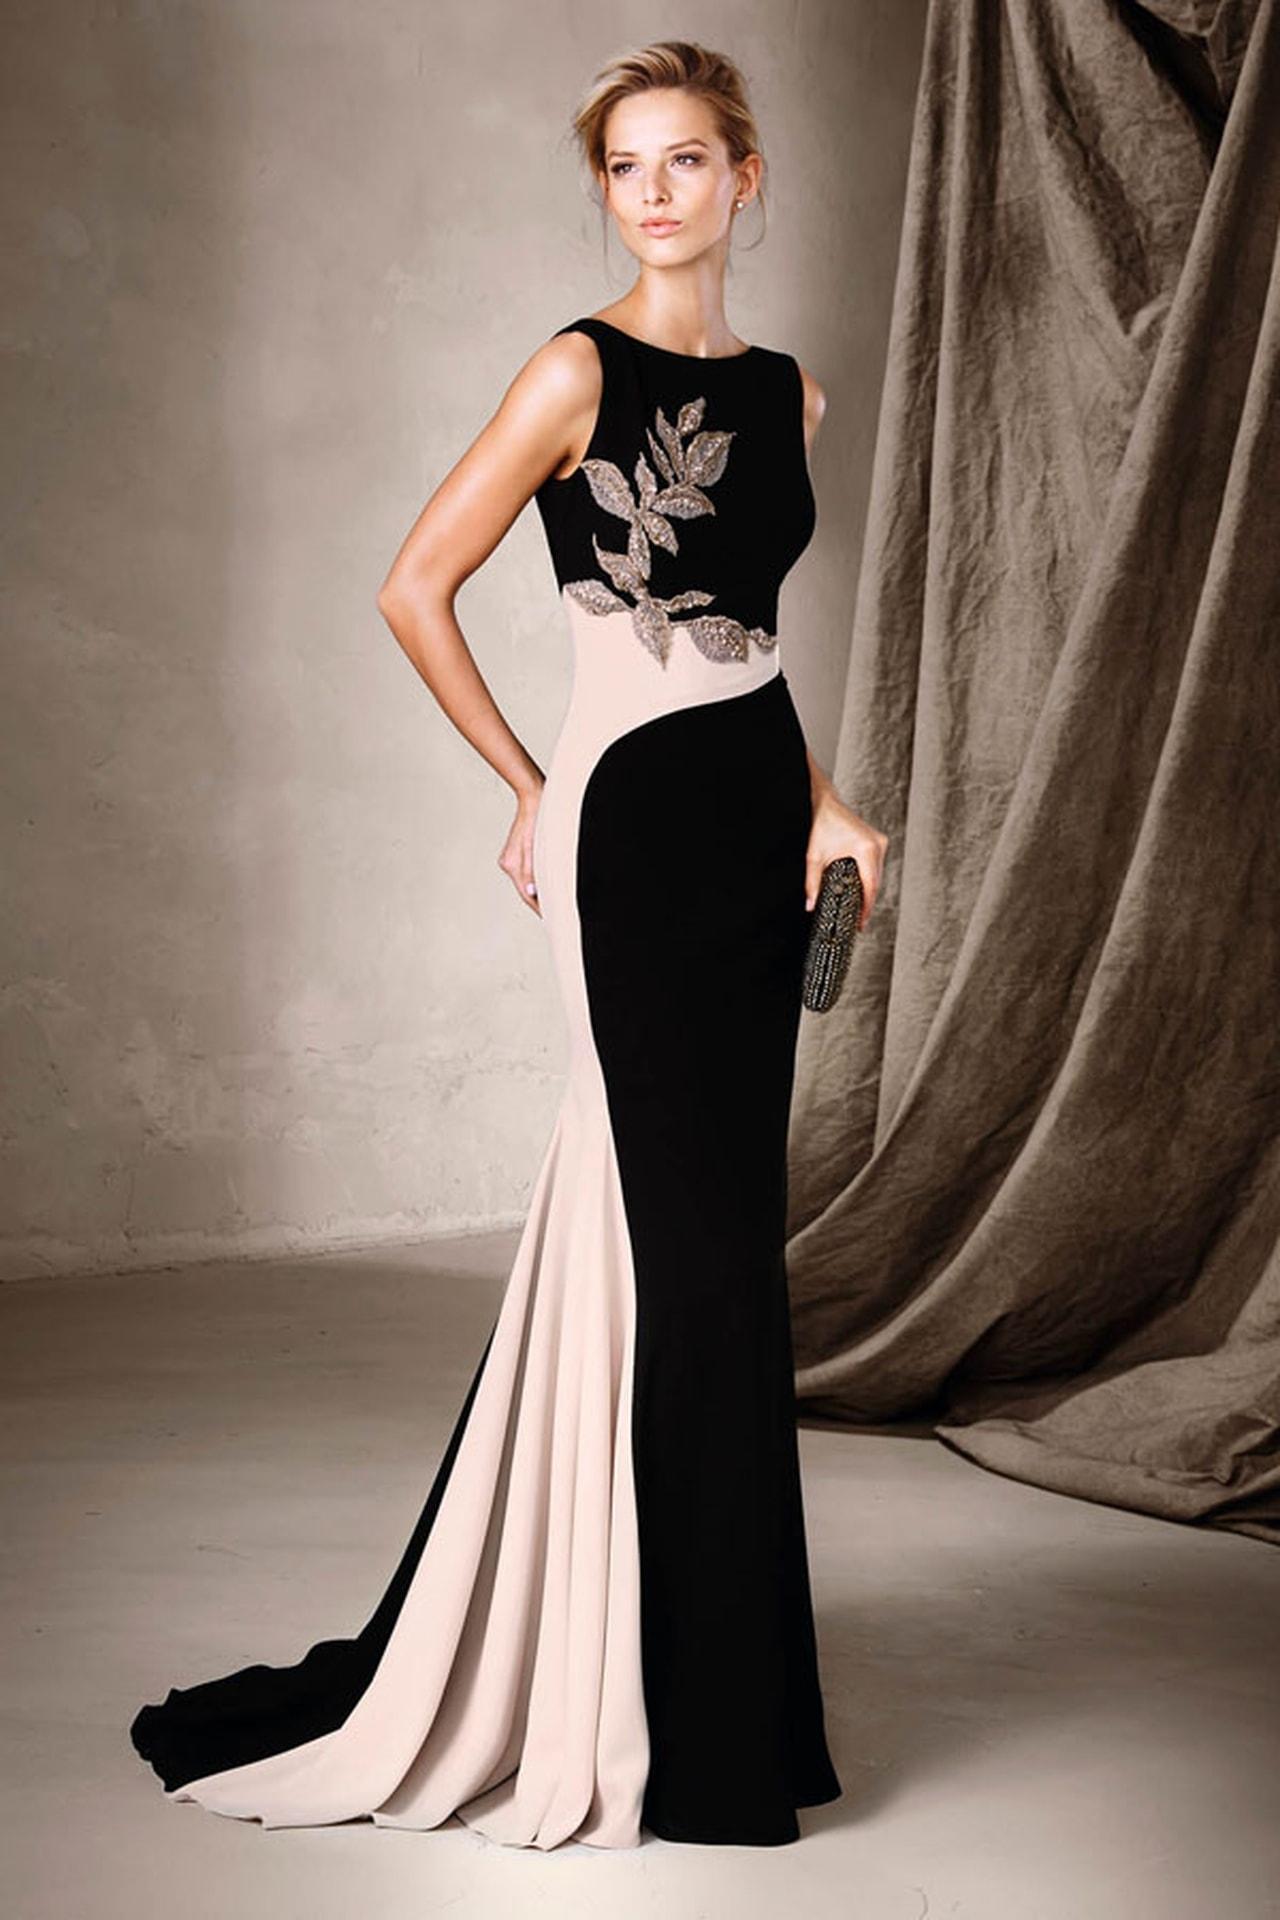 bdc00079a احدث موديلات الفساتين , تصاميم جديدة للفساتين - عيون الرومانسية